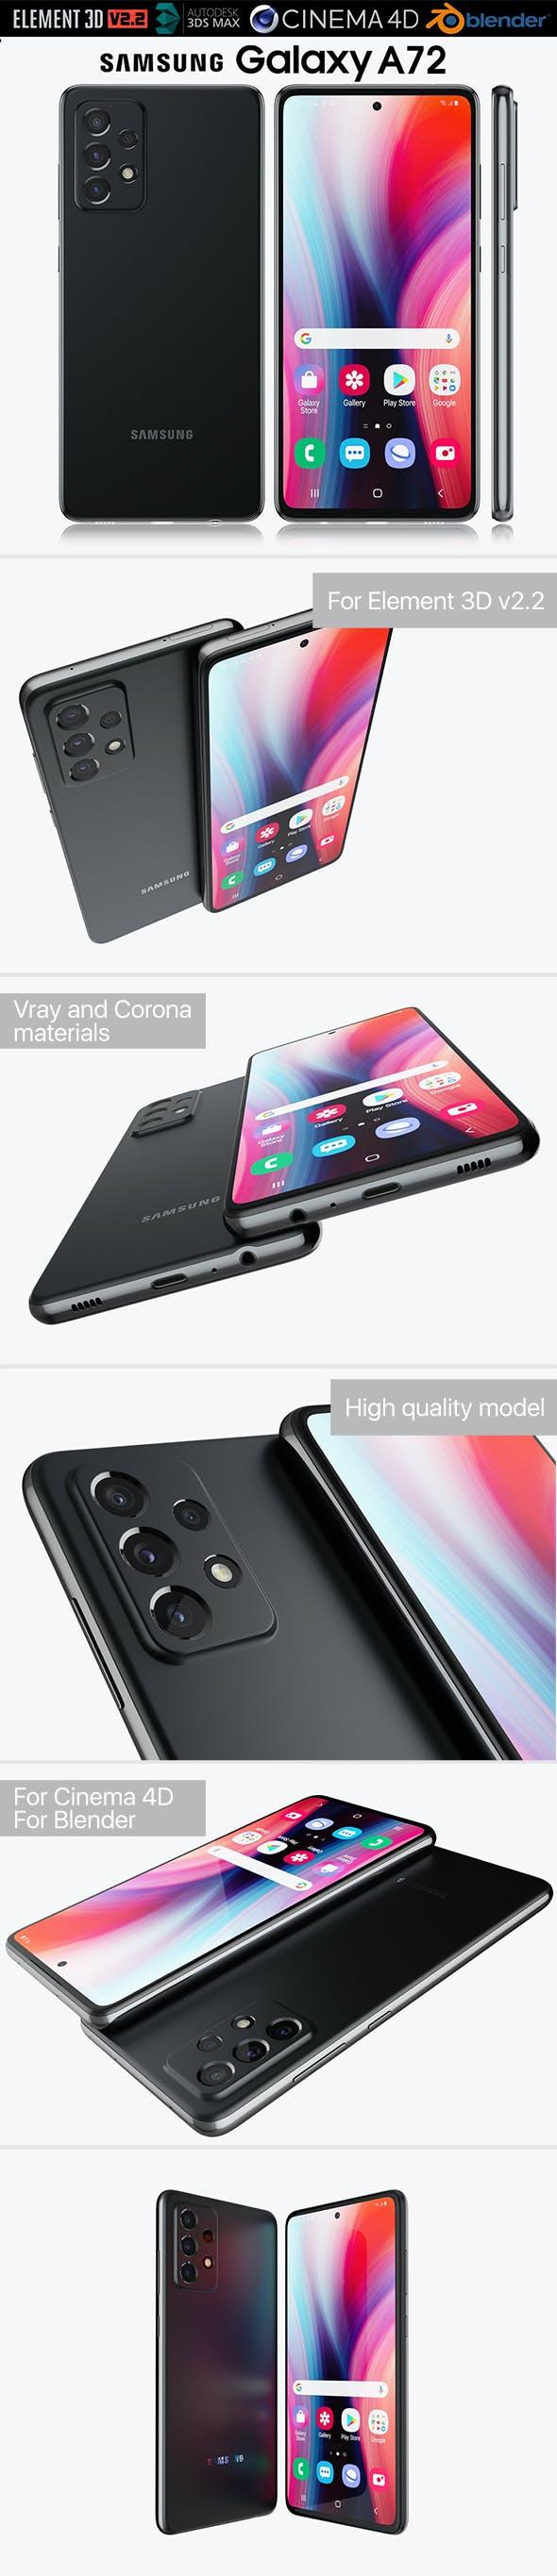 Samsung Galaxy A72 - 3DOcean Item for Sale